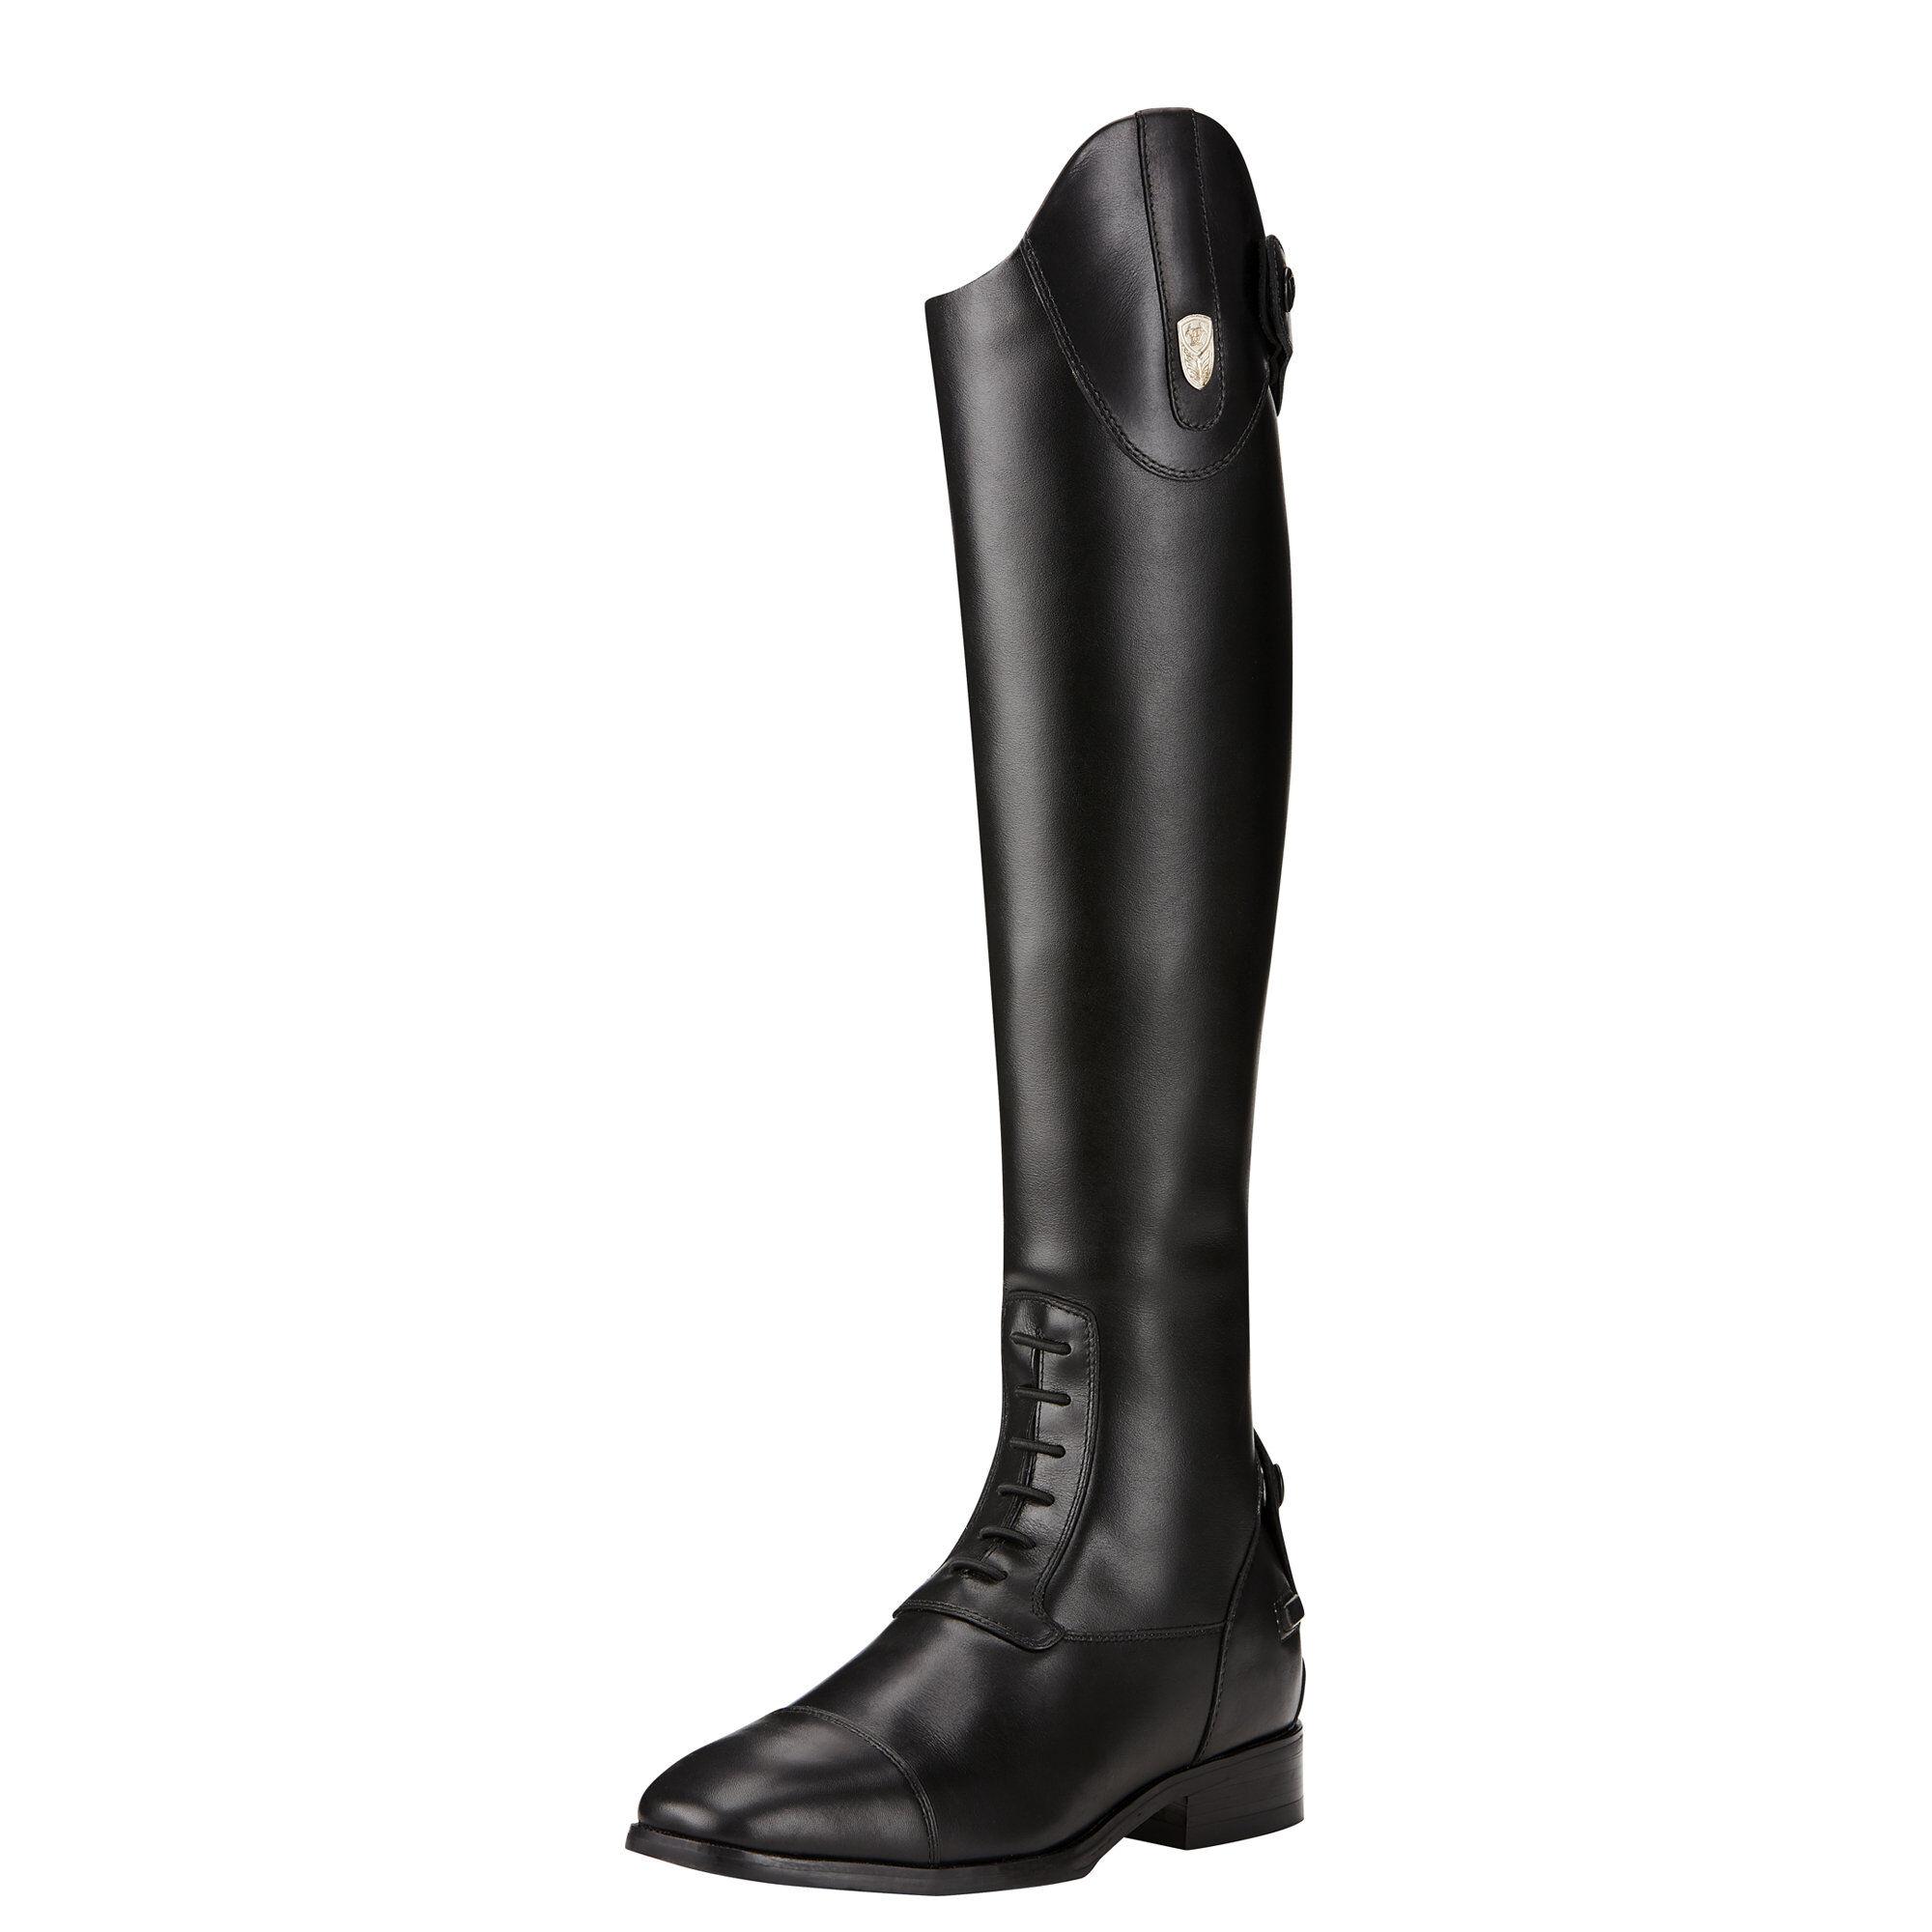 Monaco Stretch Field Zip Tall Riding Boot